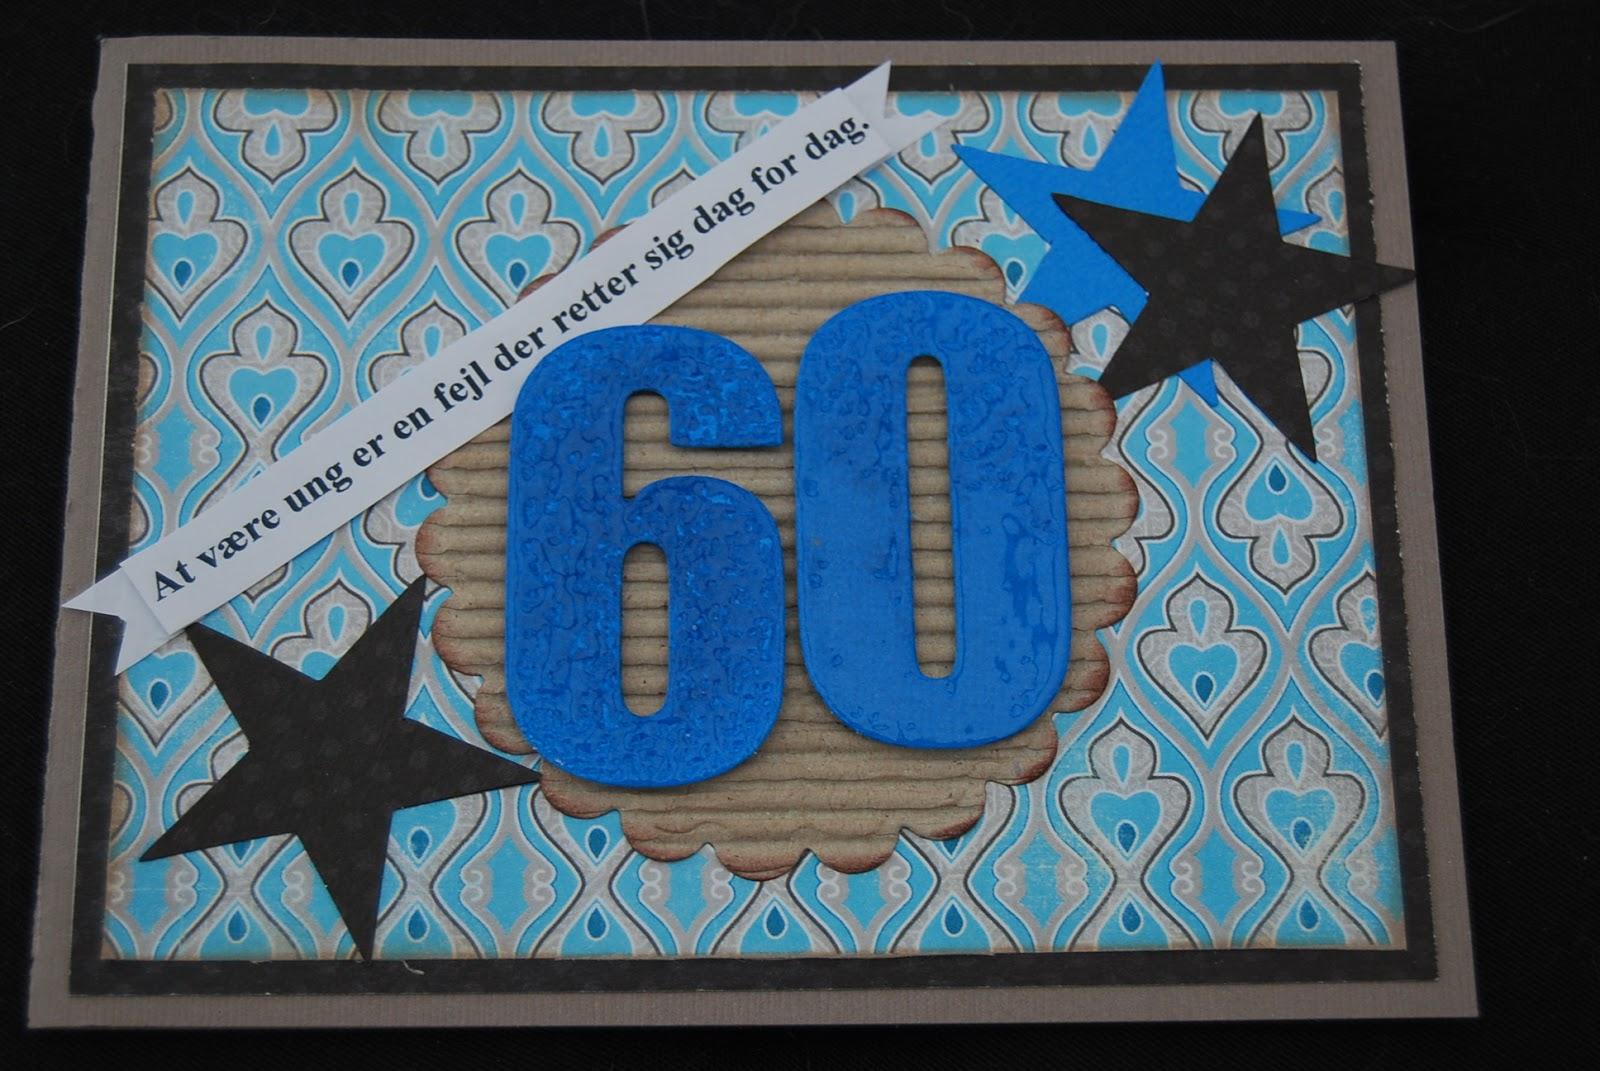 60 år citater Scrapbooking, kort, æsker m.m.: 60 års kort 60 år citater